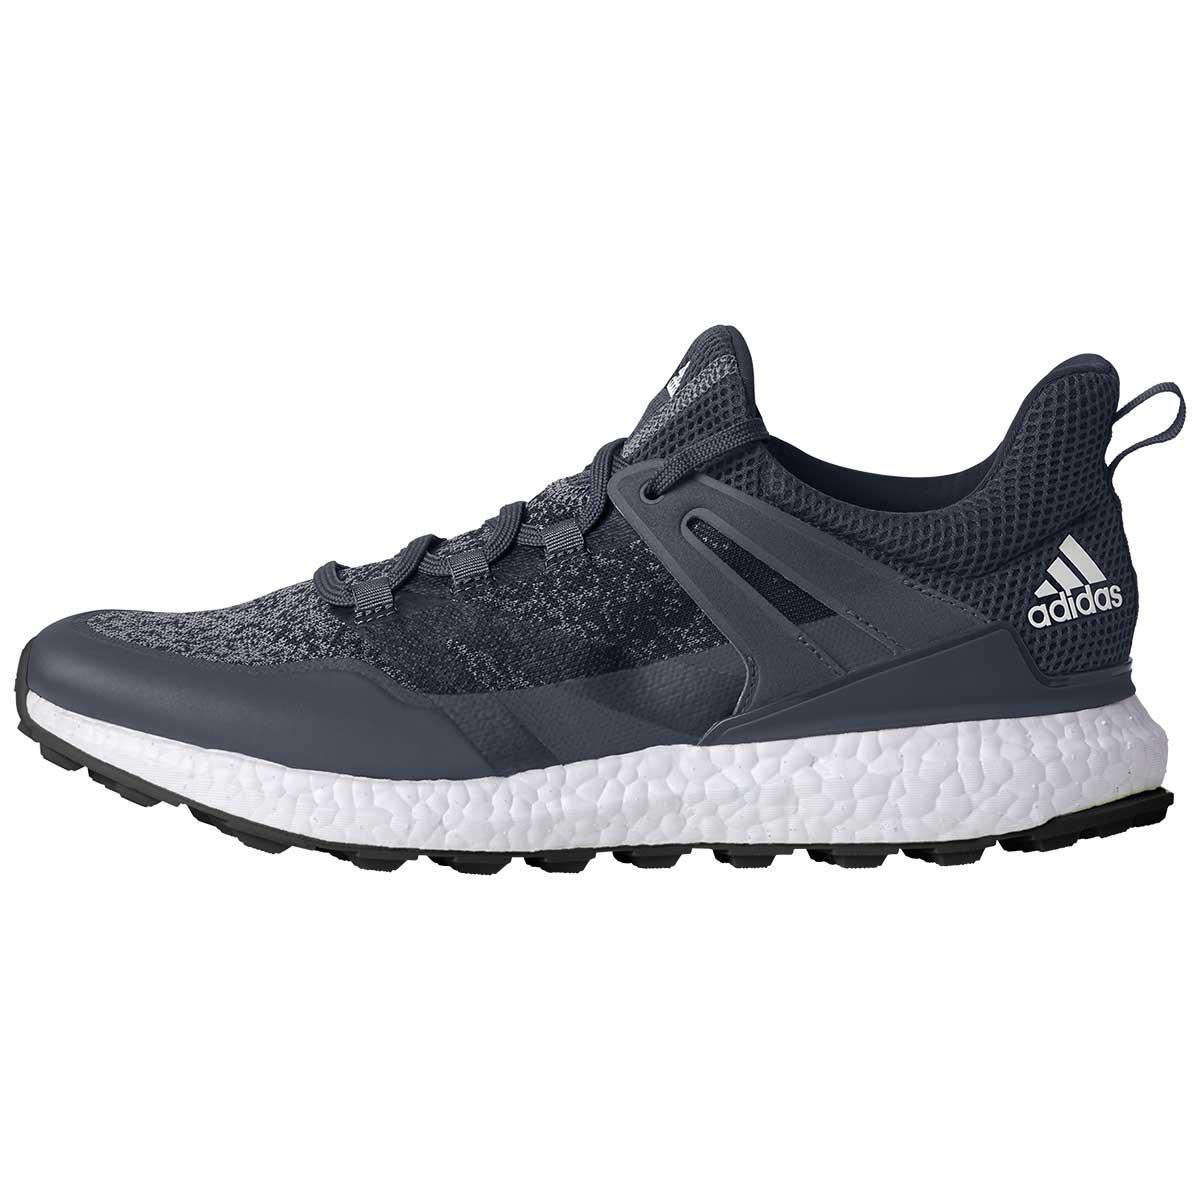 adidas Men's Crossknit Boost Golf Shoe - Grey/Onix/White